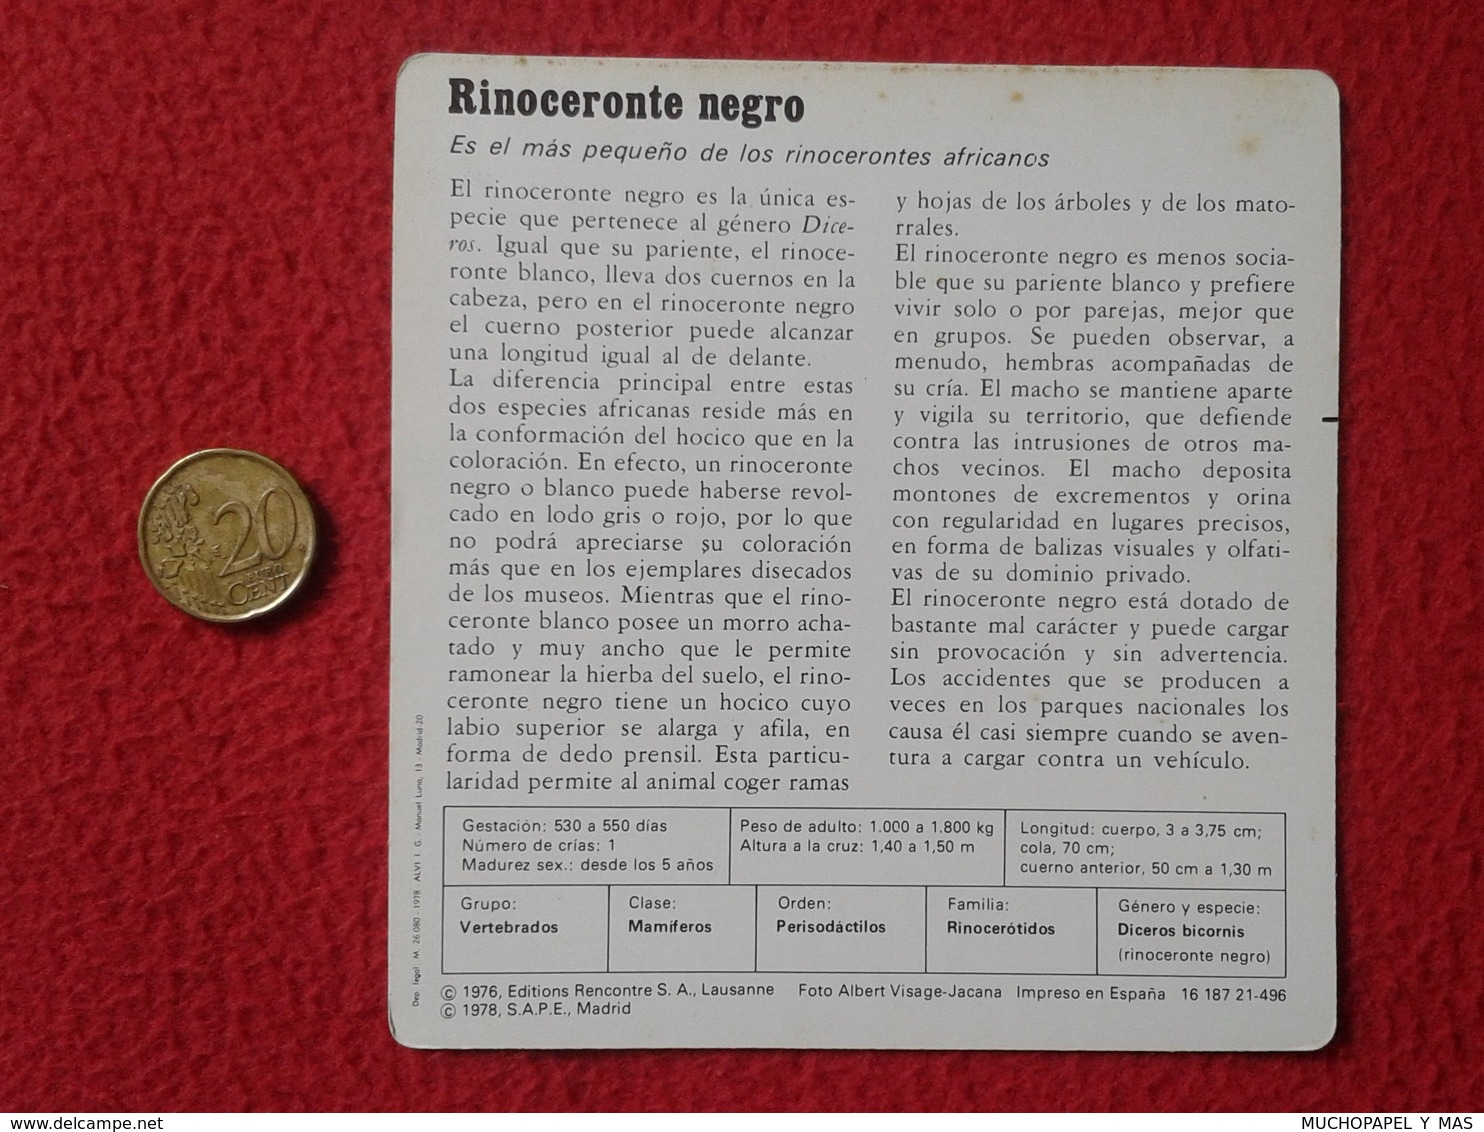 ESPAGNE SPAIN FICHA SHEET FICHE RINOCERONTE NEGRO BLACK RHINO RHINOCEROS RHINOS RHINOCEROSES RINOCERONTES WILDLIFE FAUNA - Animales